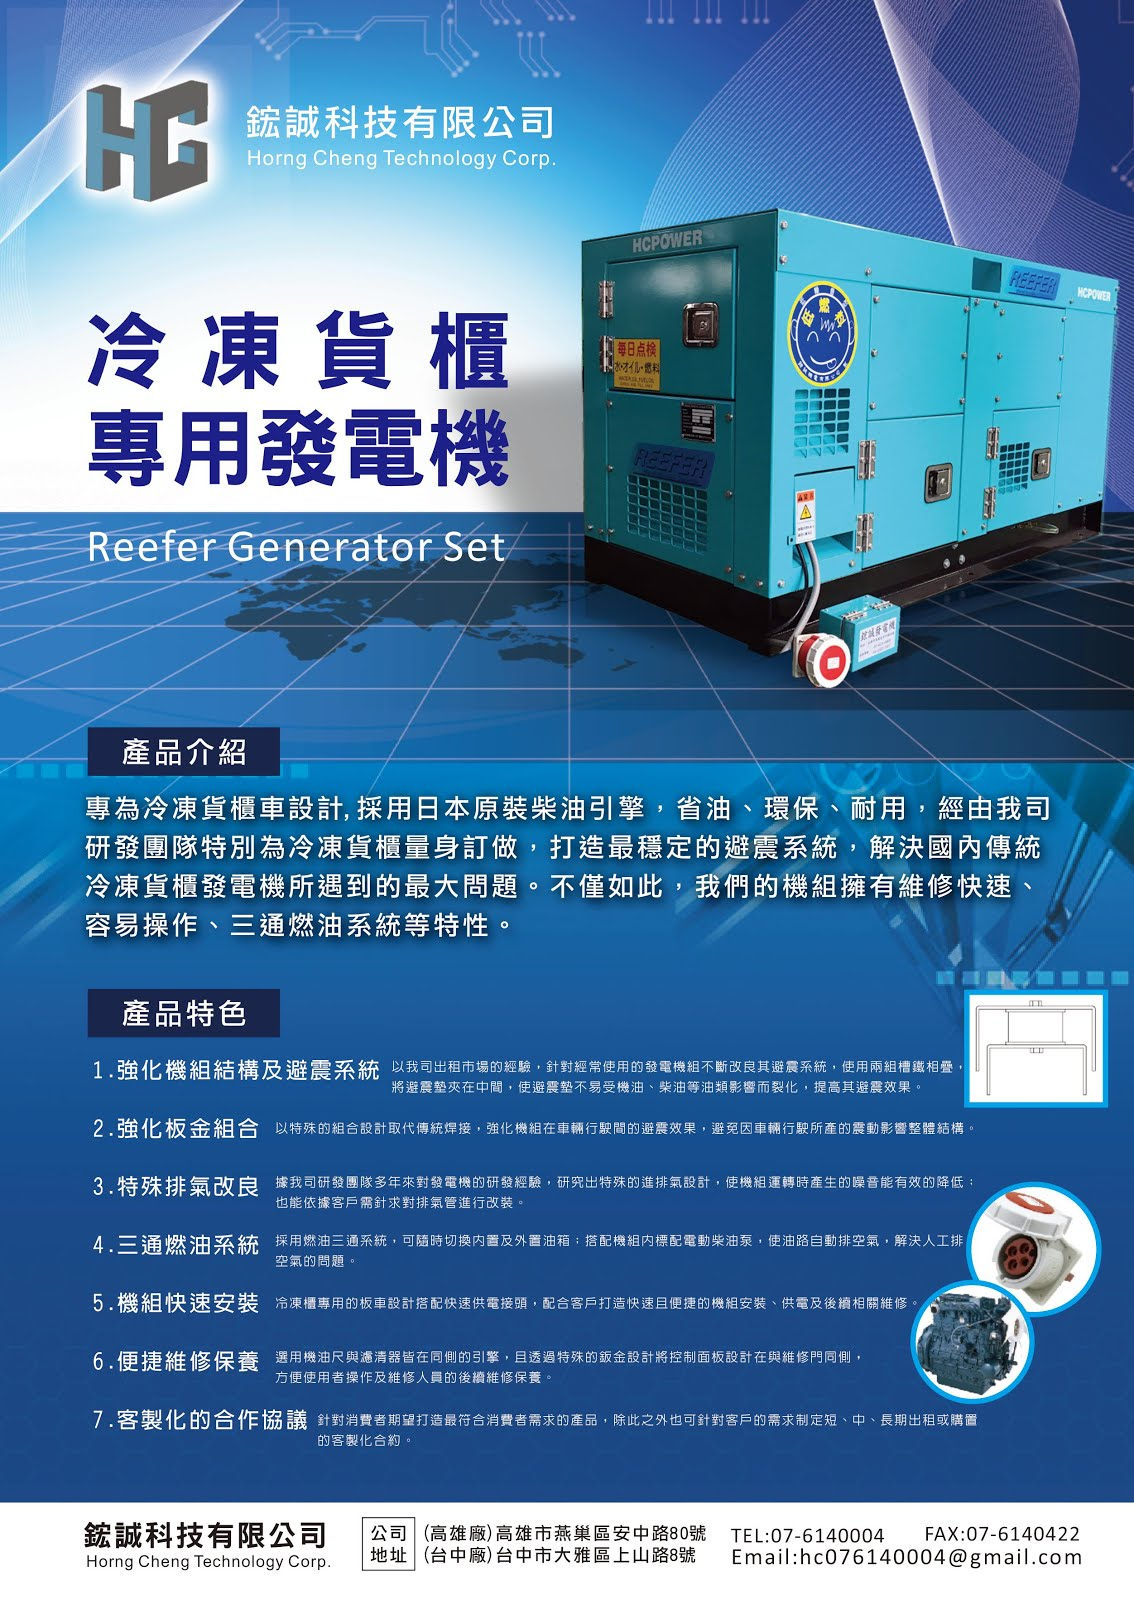 30kw發電機, 60kw發電機, 100kw發電機, 150kw發電機, 300kw發電機, 500kw發電機, 750kw發電機, 1000kw發電機, 2000kw發電機,